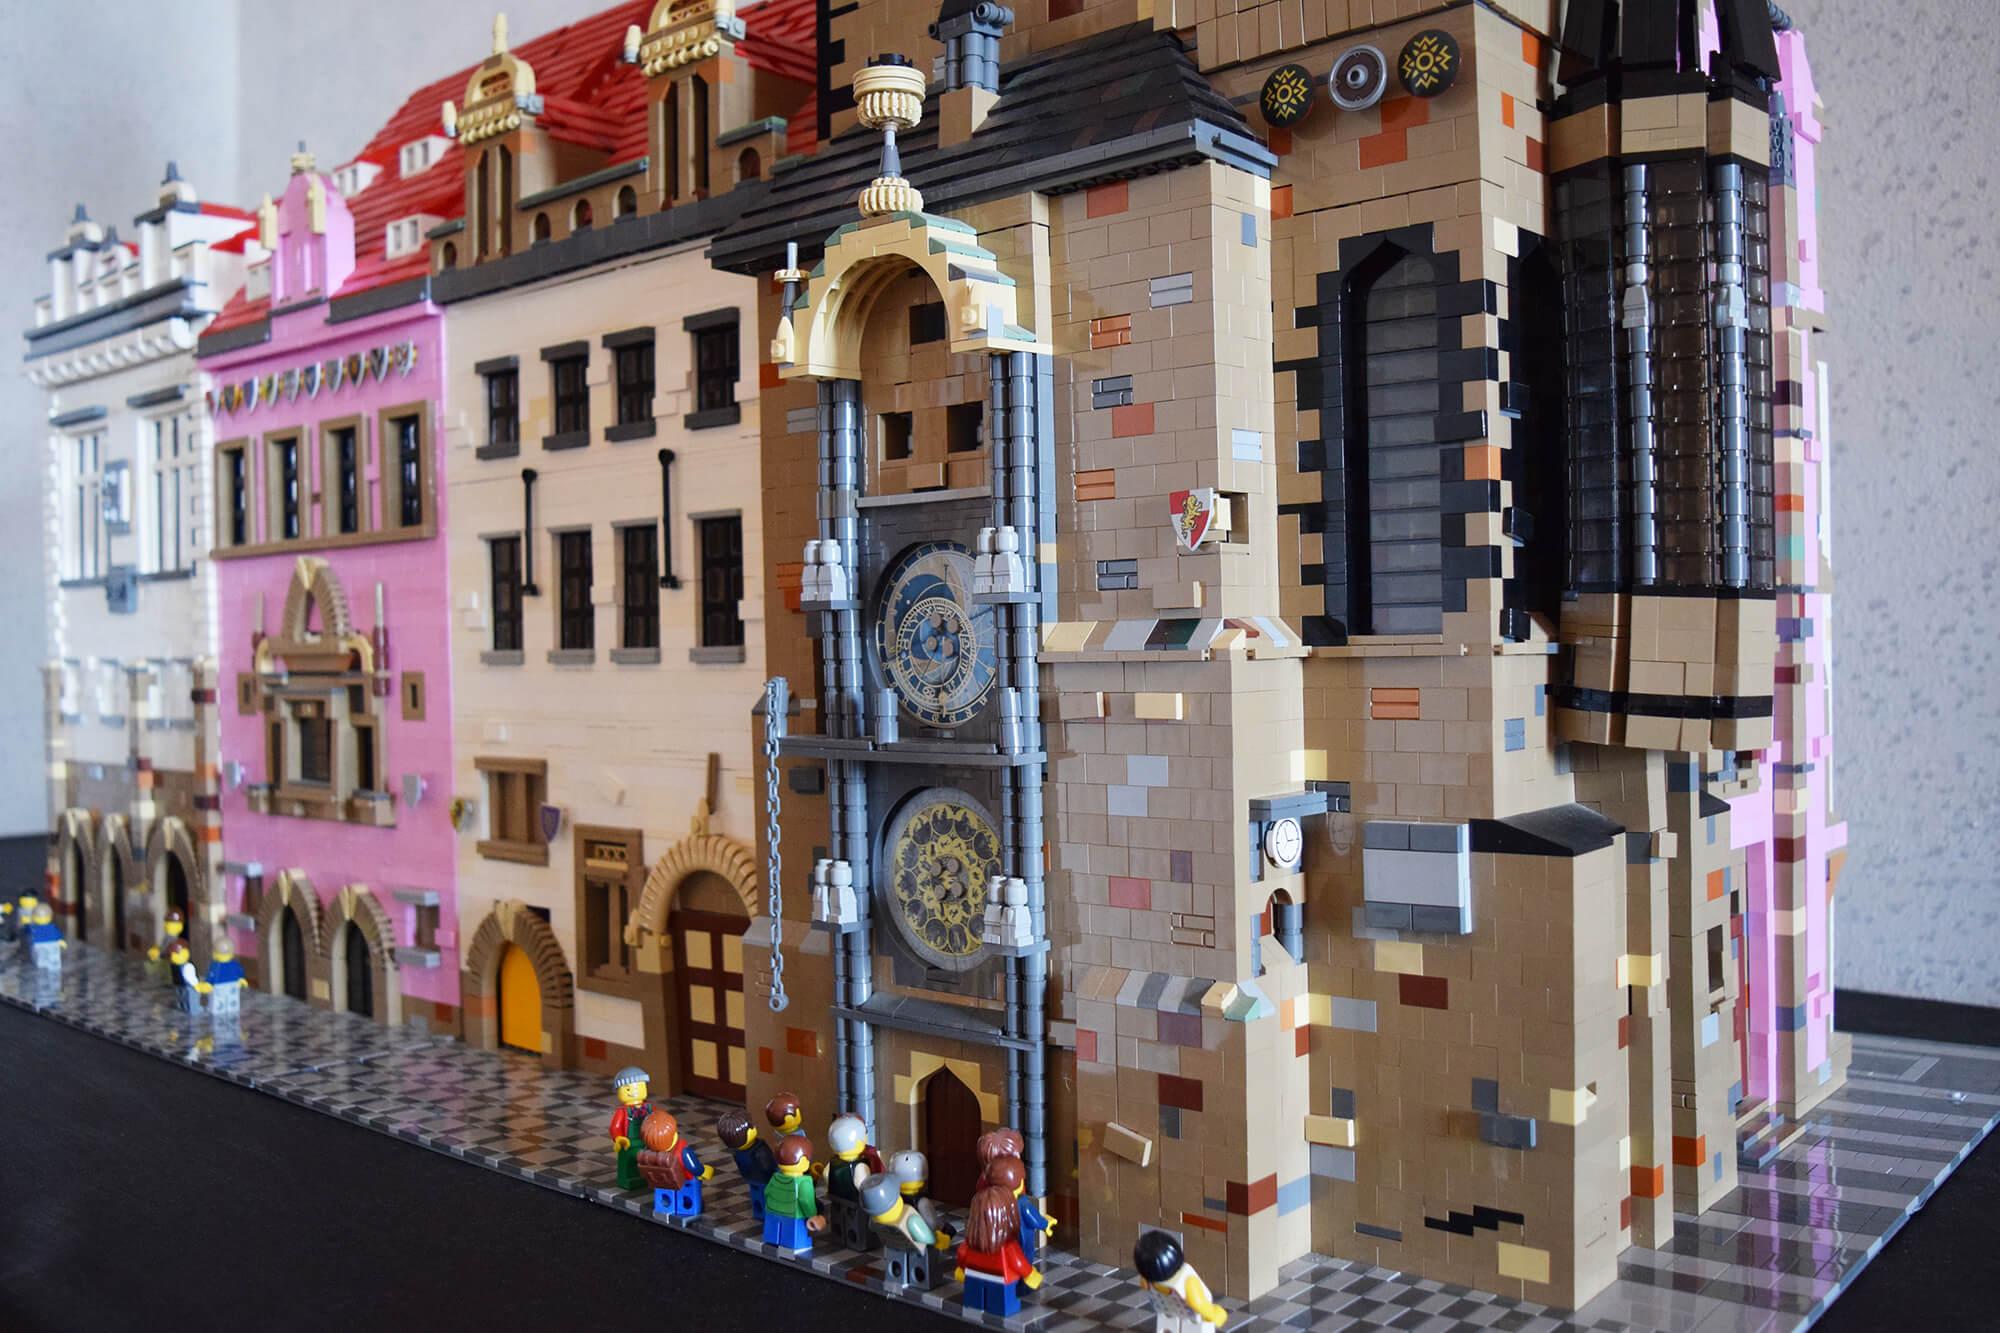 Pražský orloj sestavený z kostek LEGO